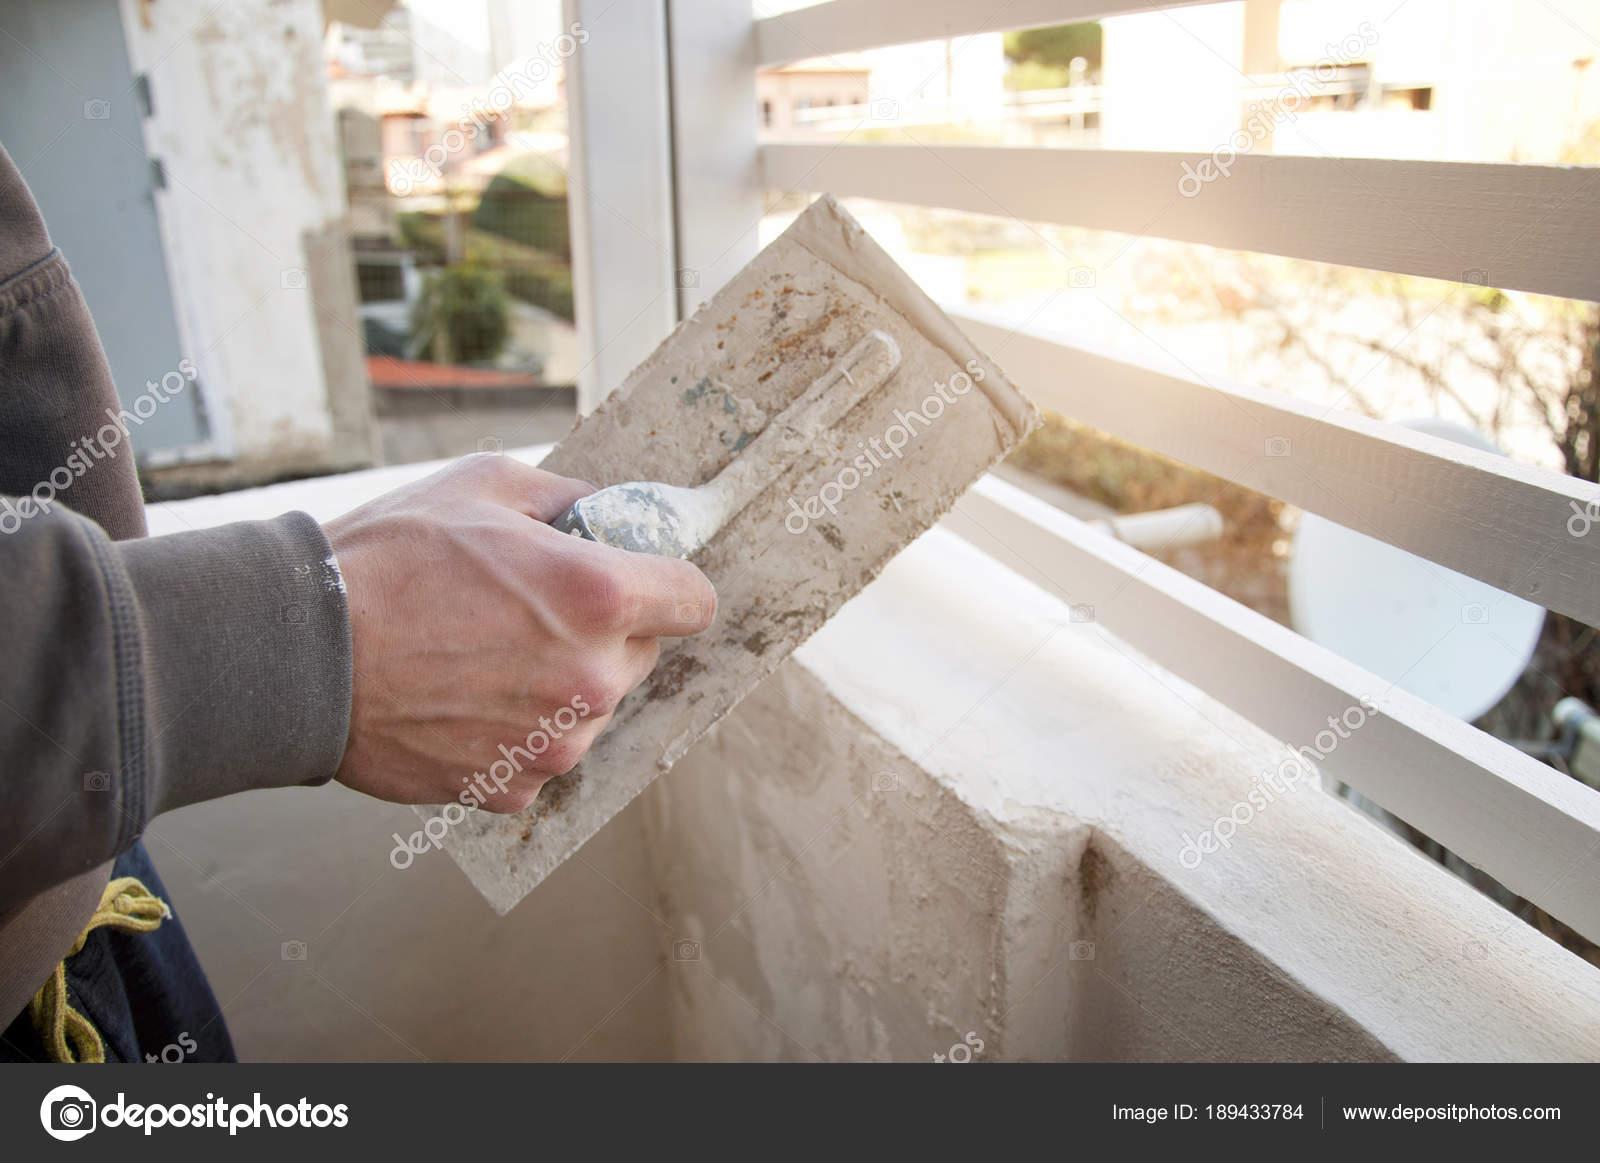 Man Verputzen Wand Auf Terrasse — Stockfoto © katy89 #189433784